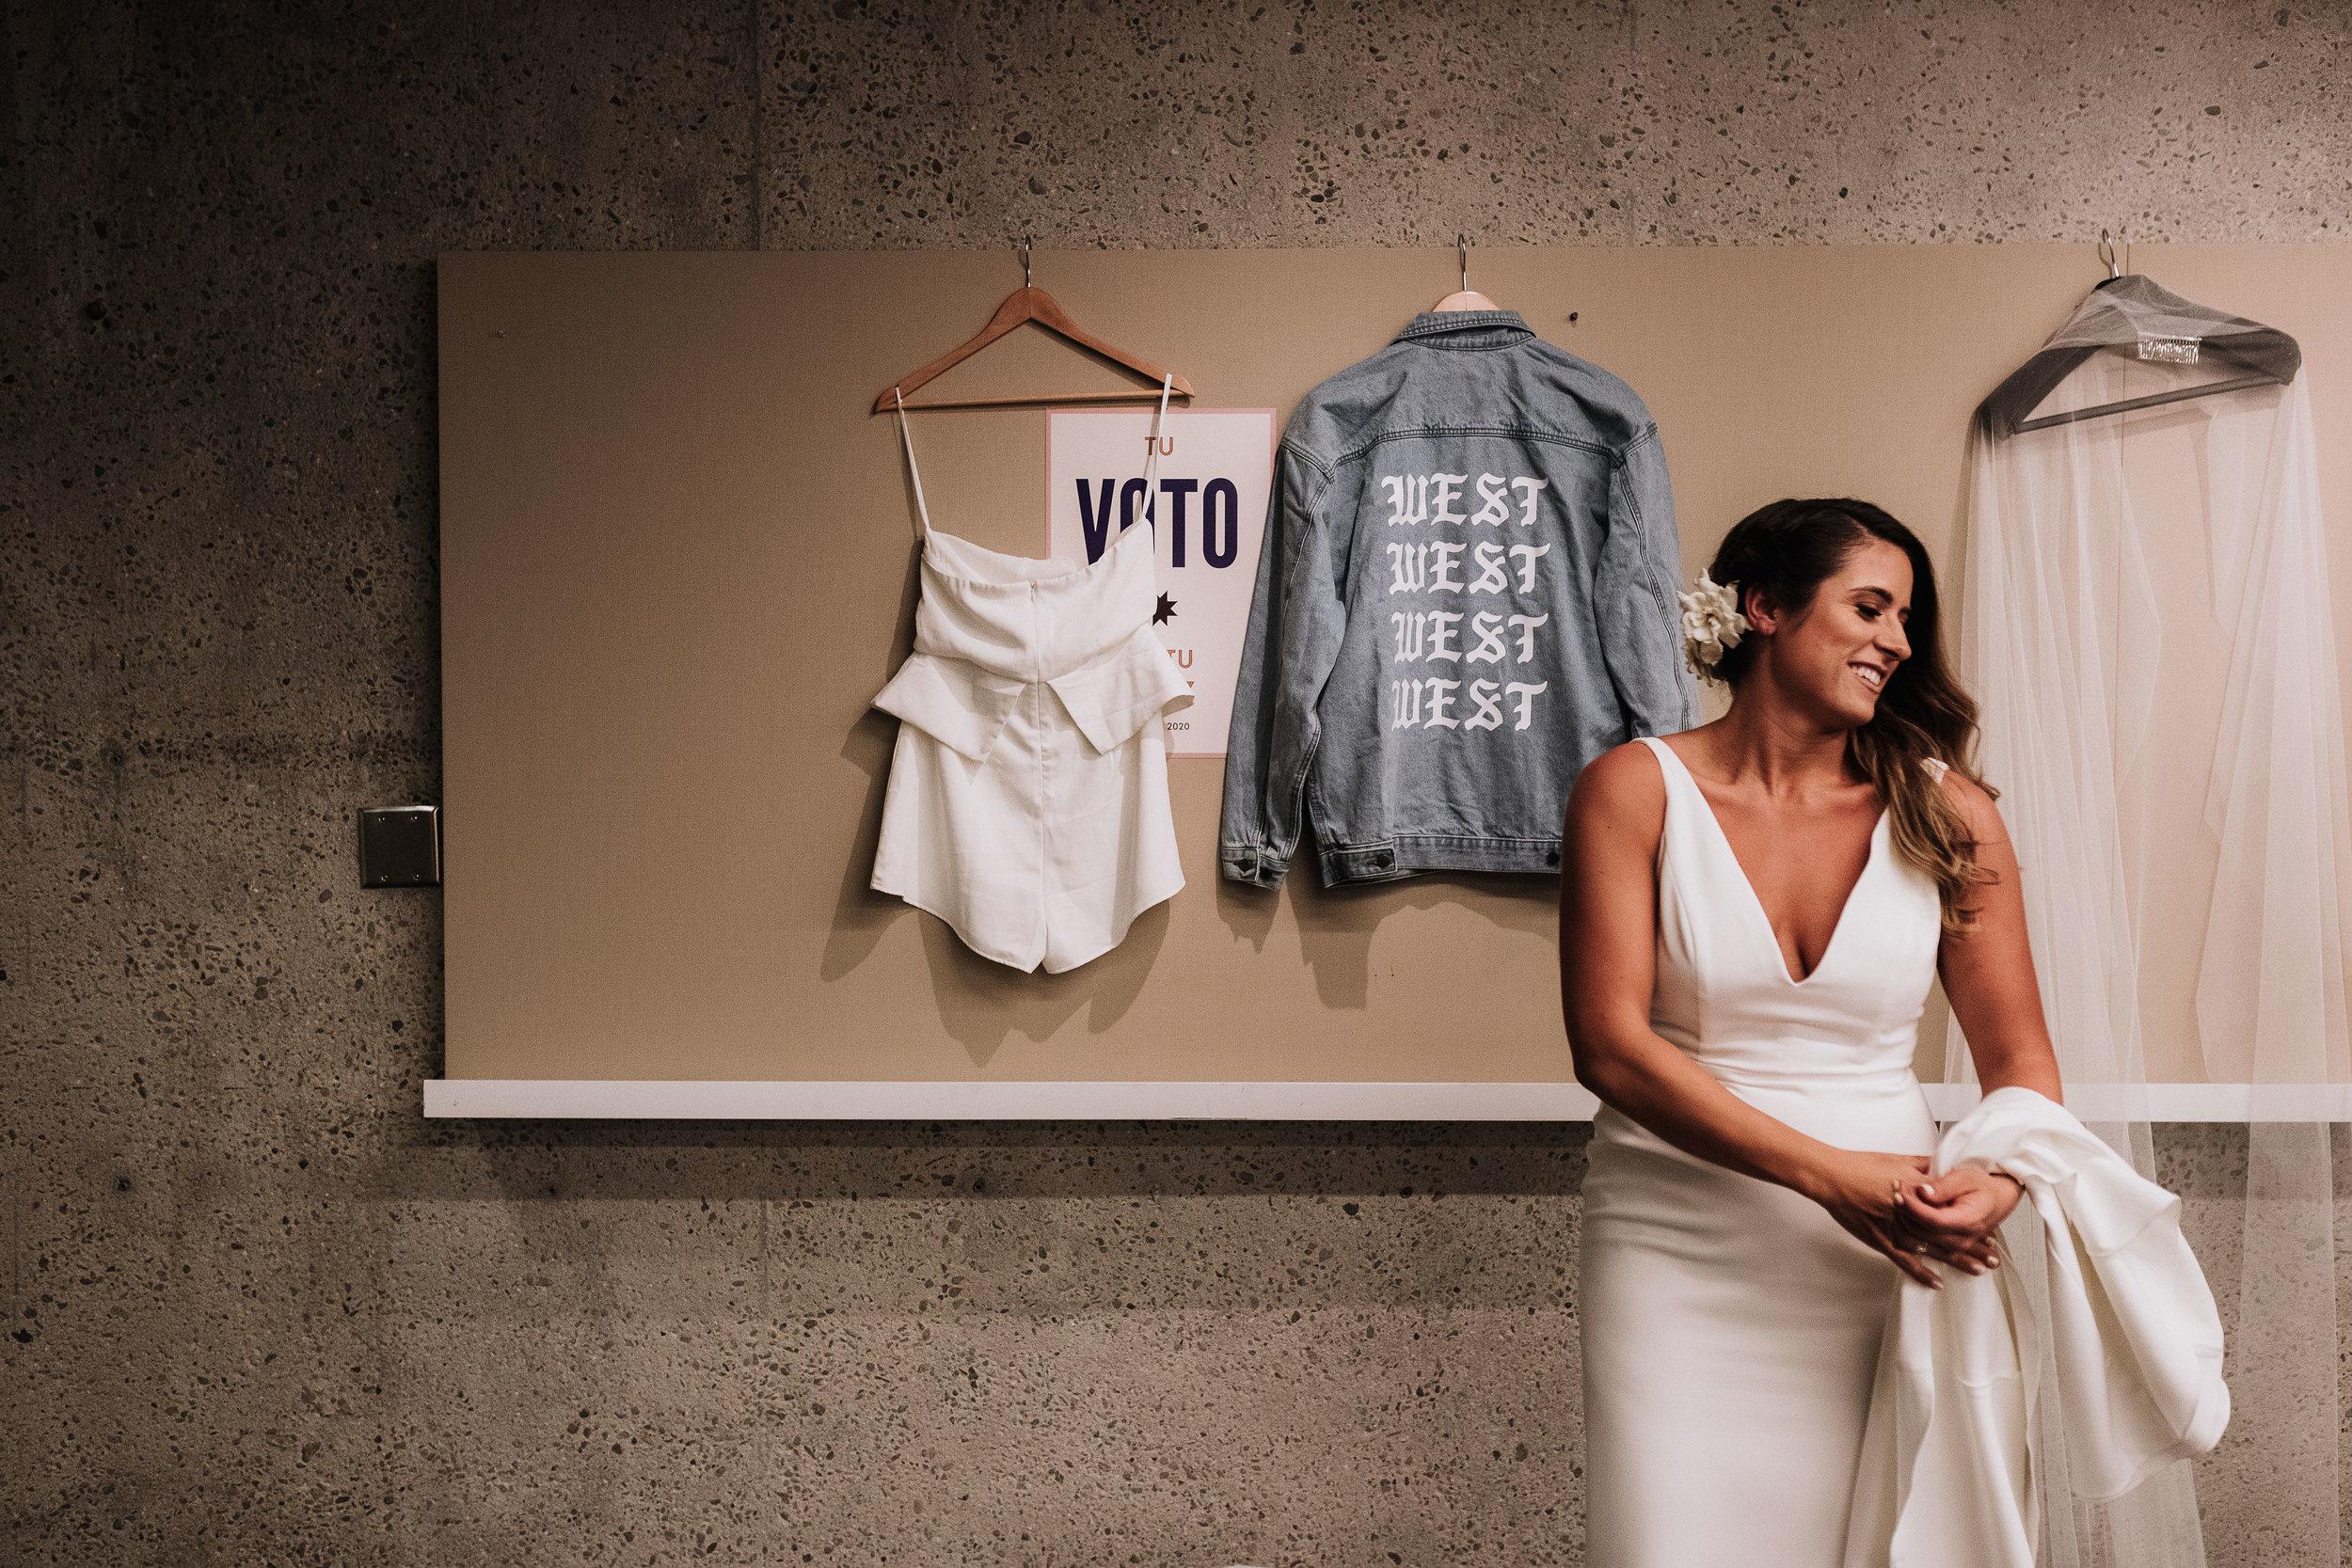 West Jean Jacket Wedding Bride Outfit Change KLdc